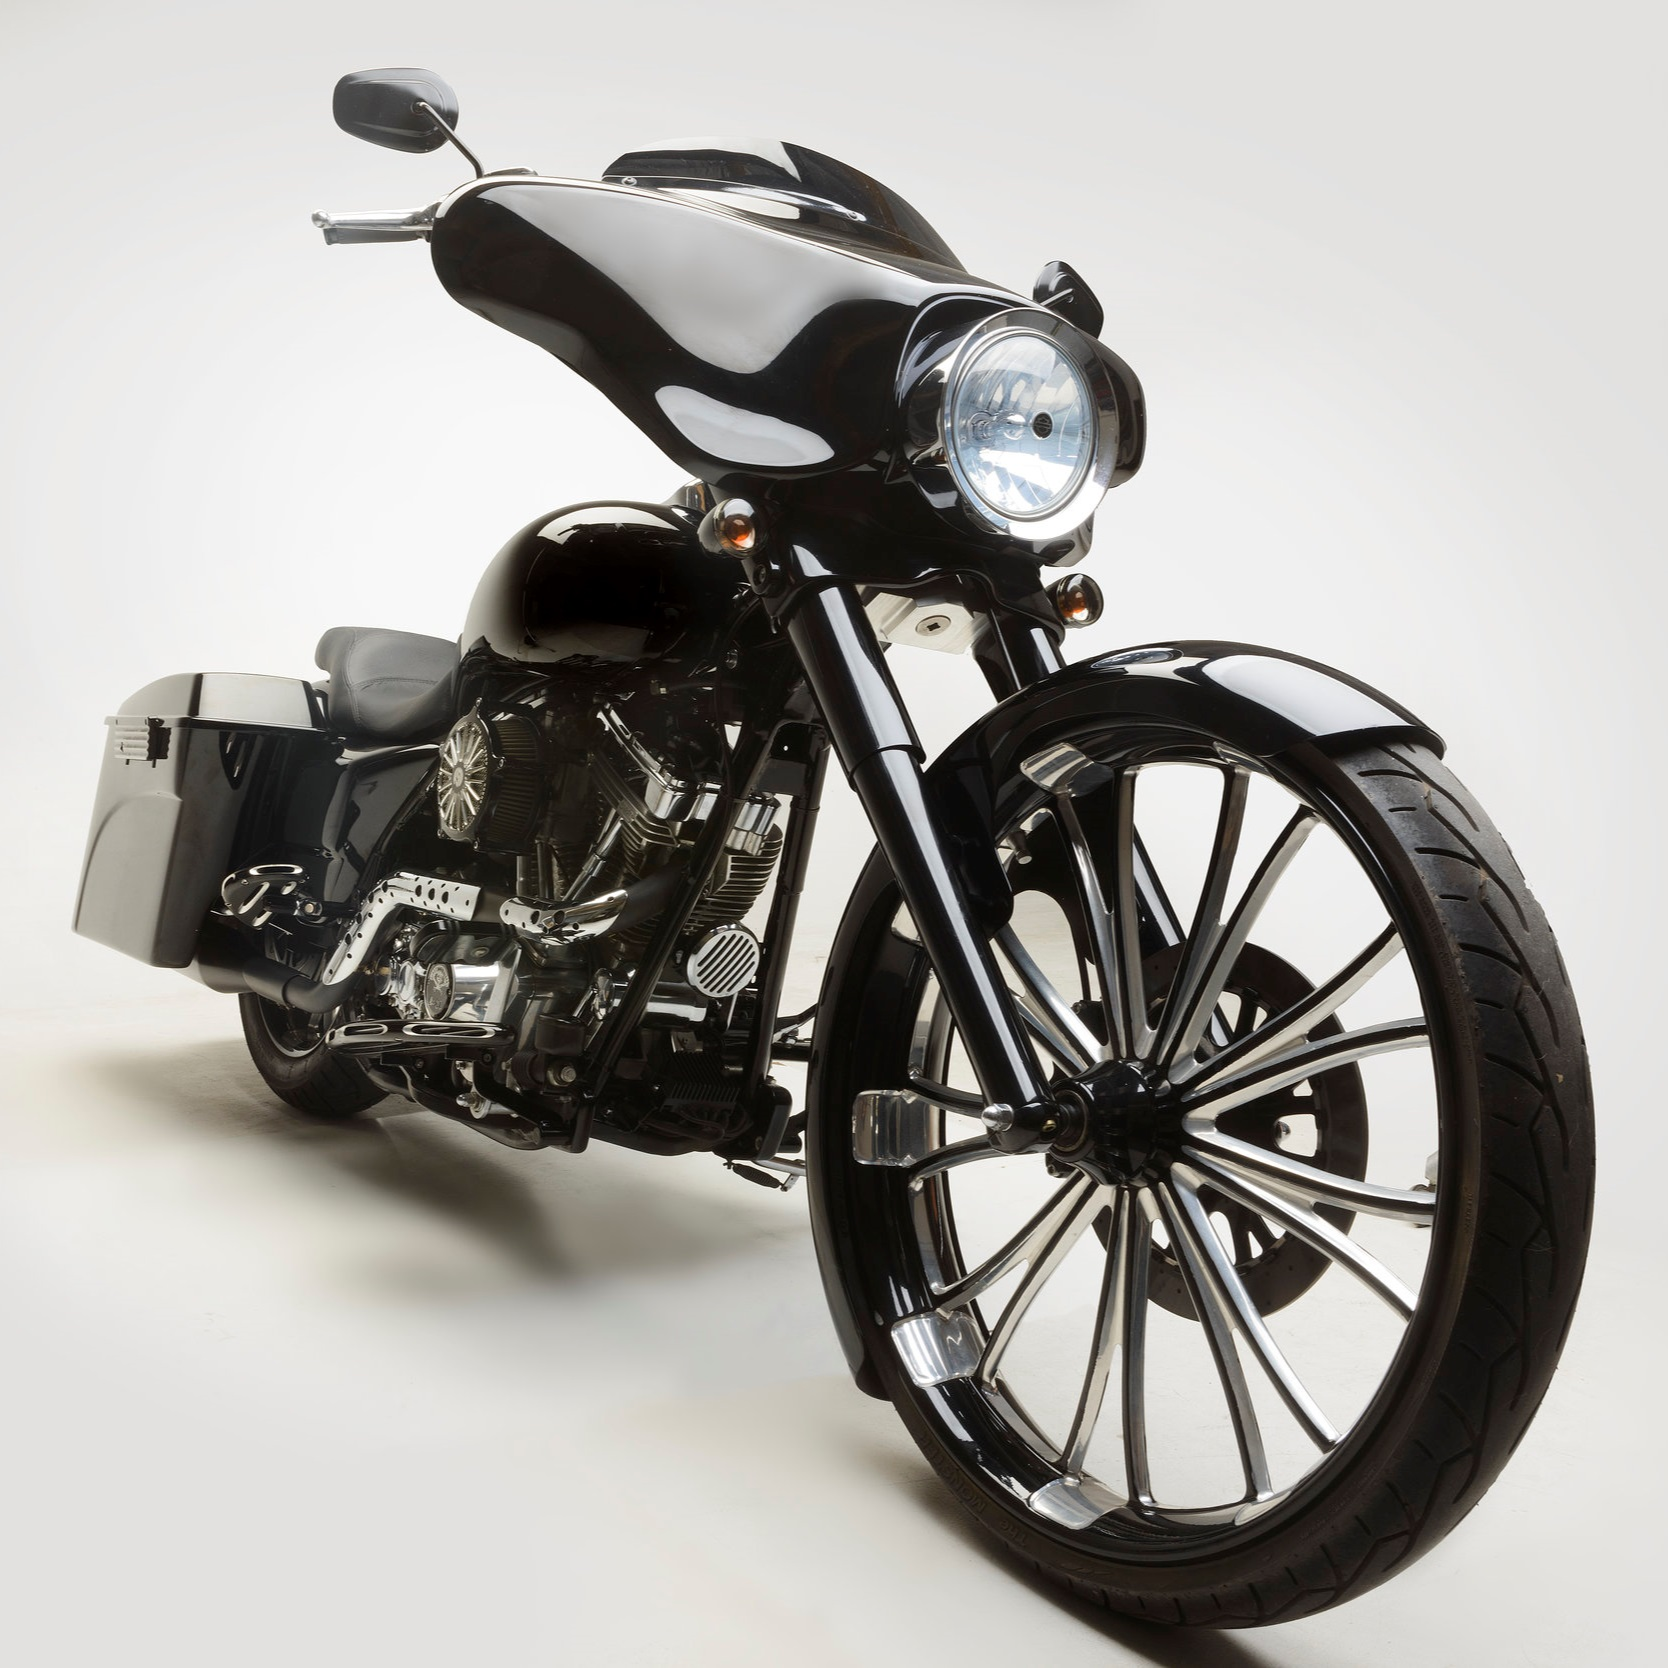 Stremmel Auction - Motorcycle - Detail Front Right quarter.jpg